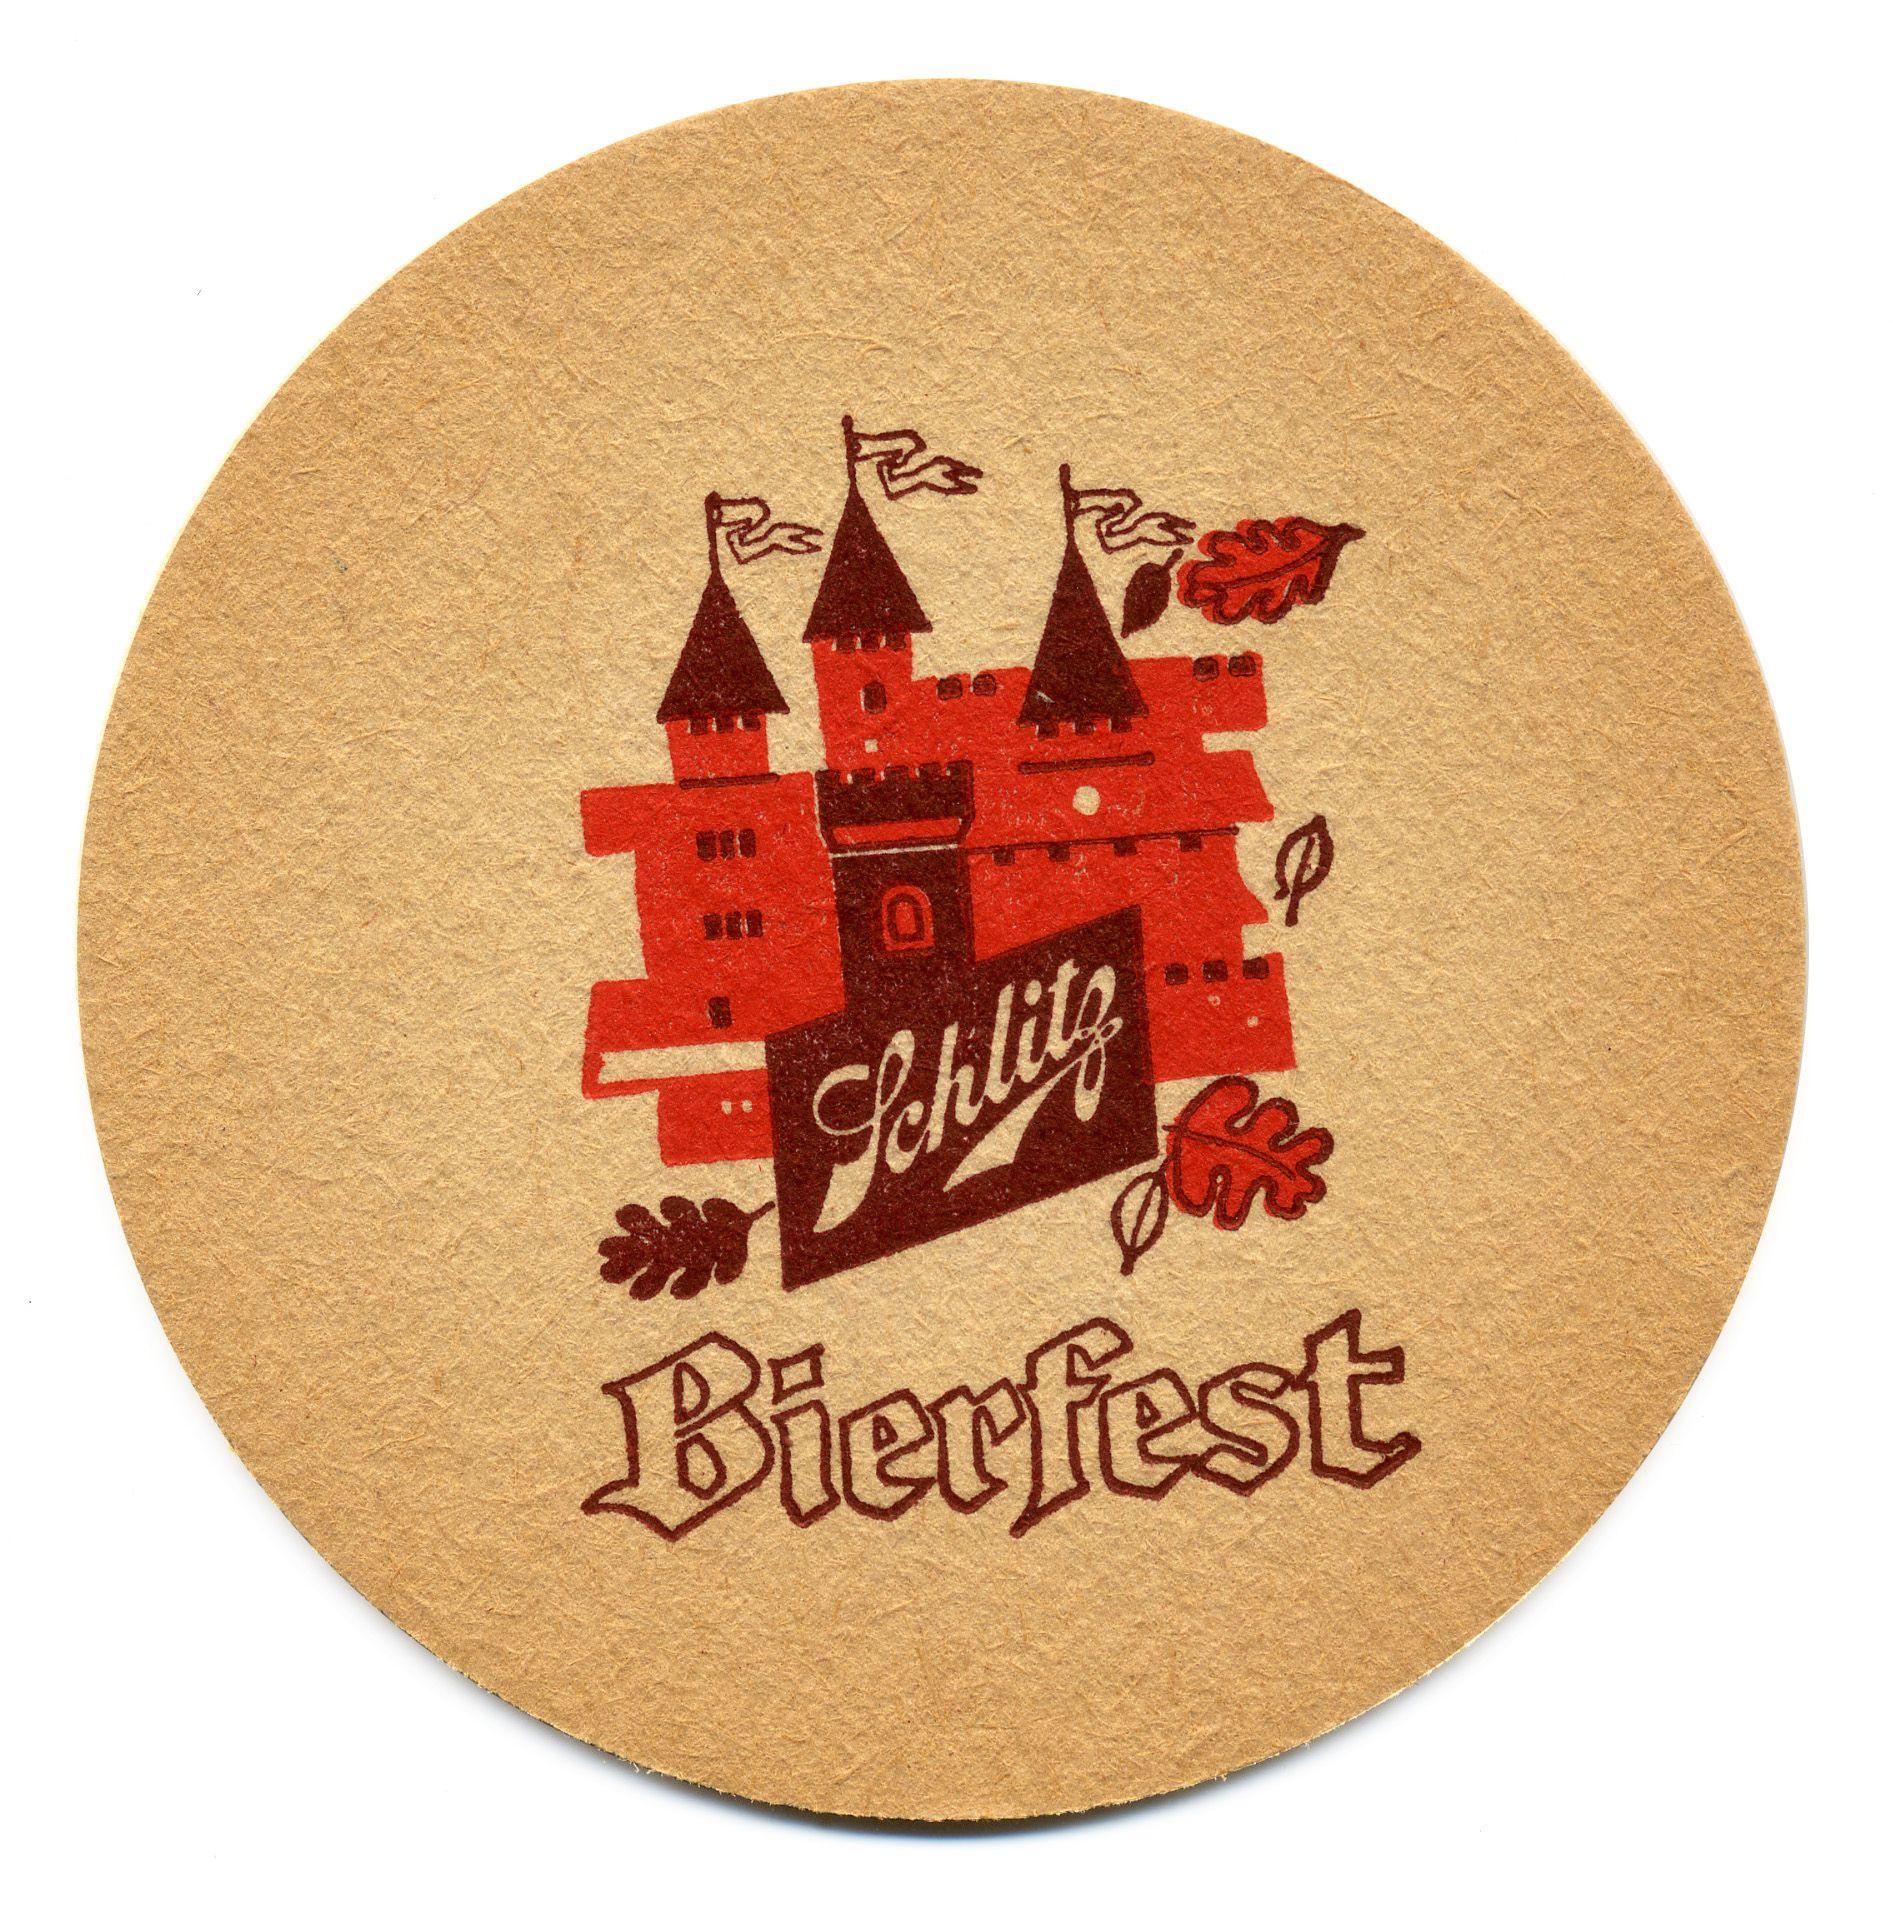 Https Www Flickr Com Photos Bartsol Sets 72157628638808523 Beer Coasters Vintage Beer Beer Signs